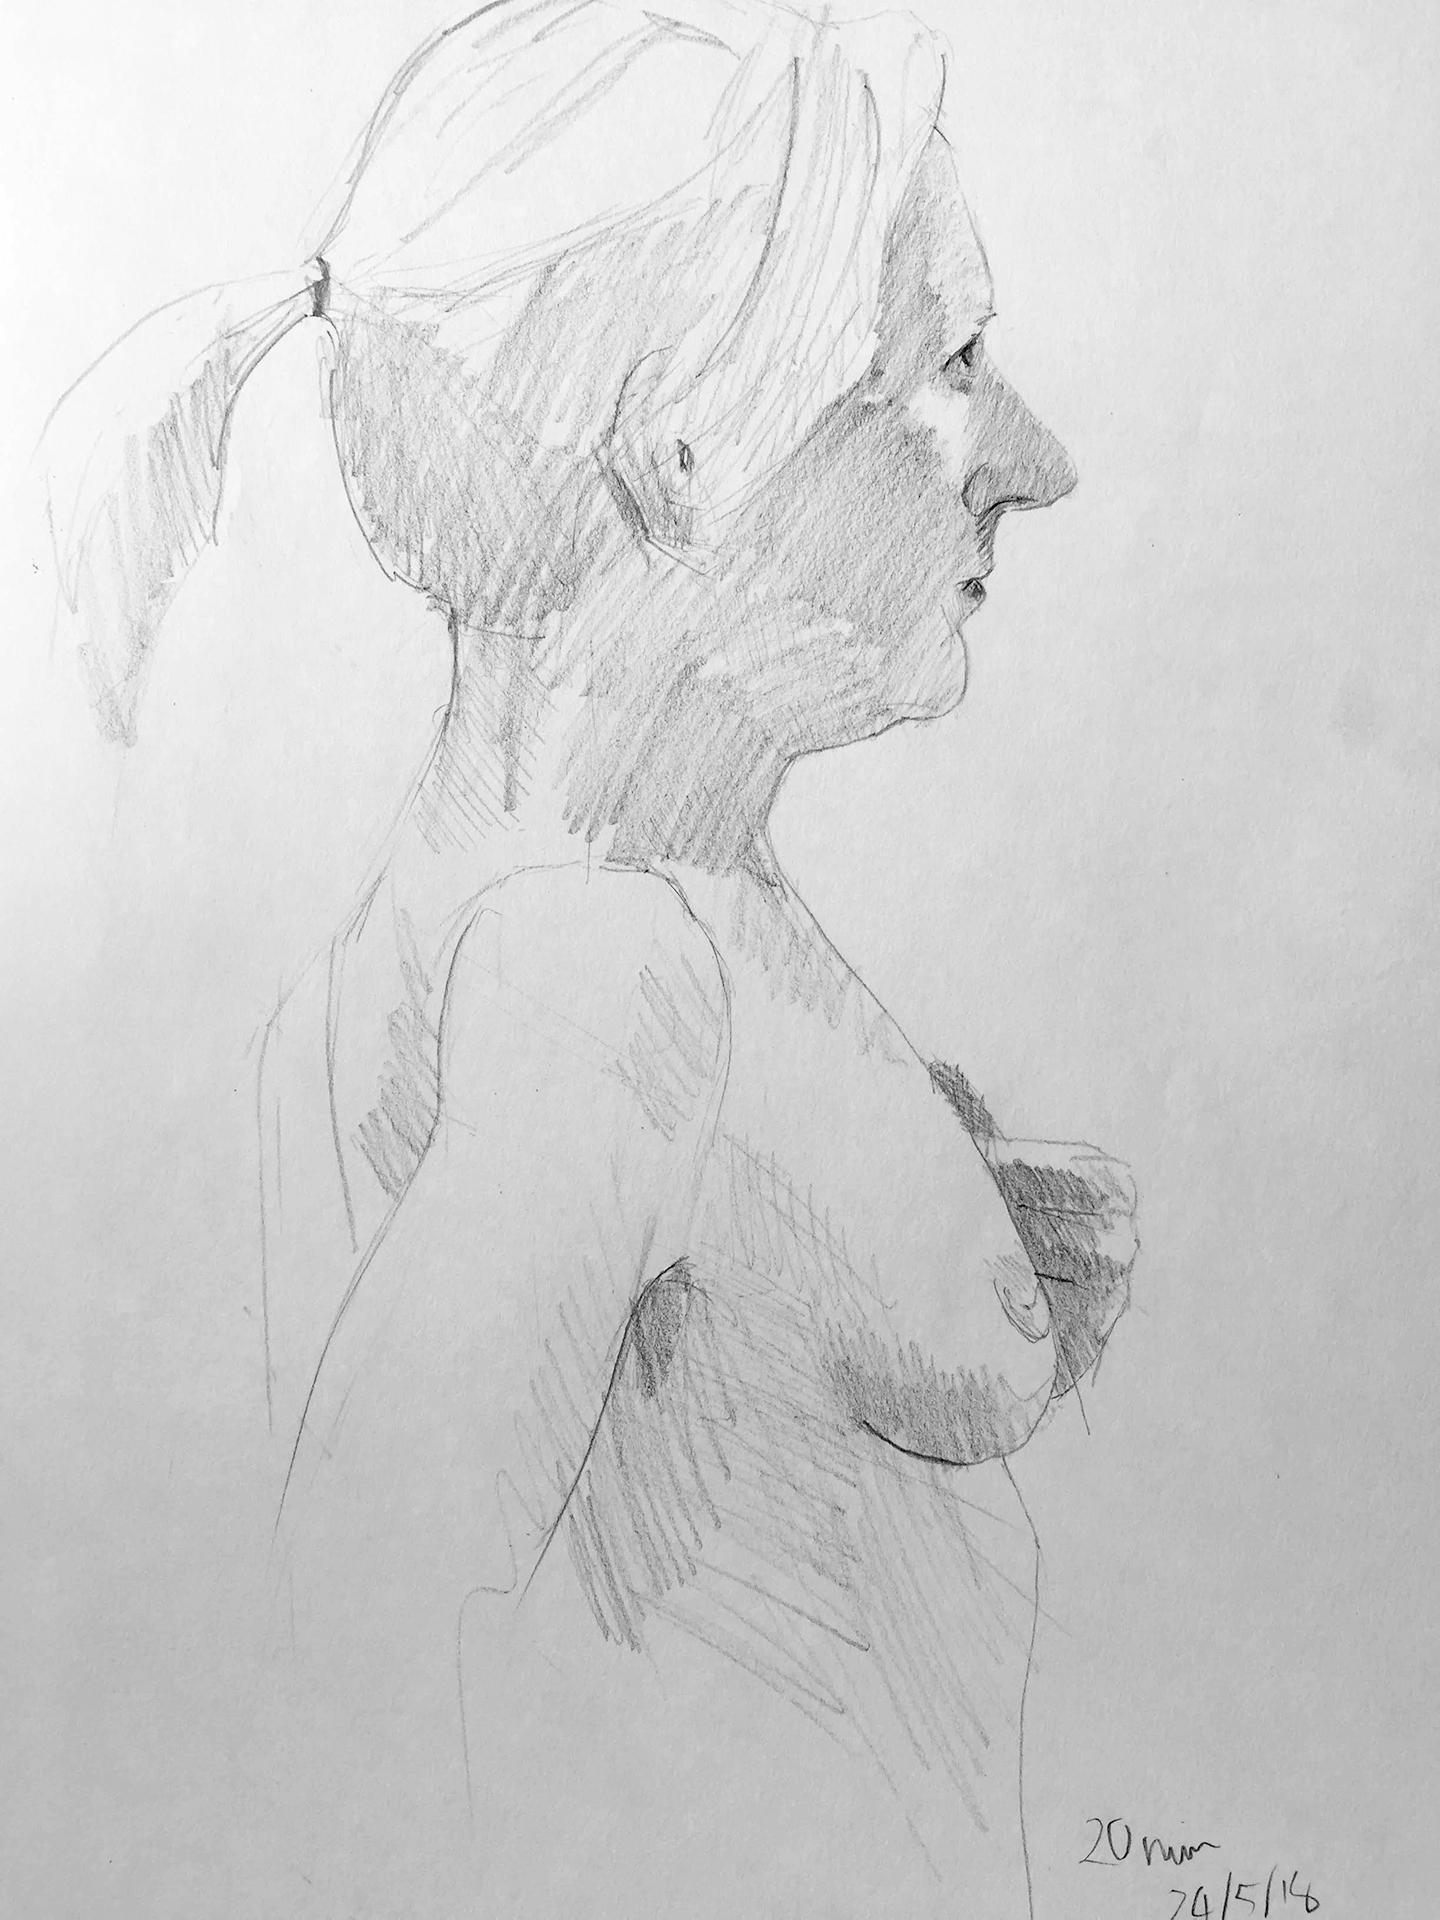 Life Drawing Sketch 24/5/18